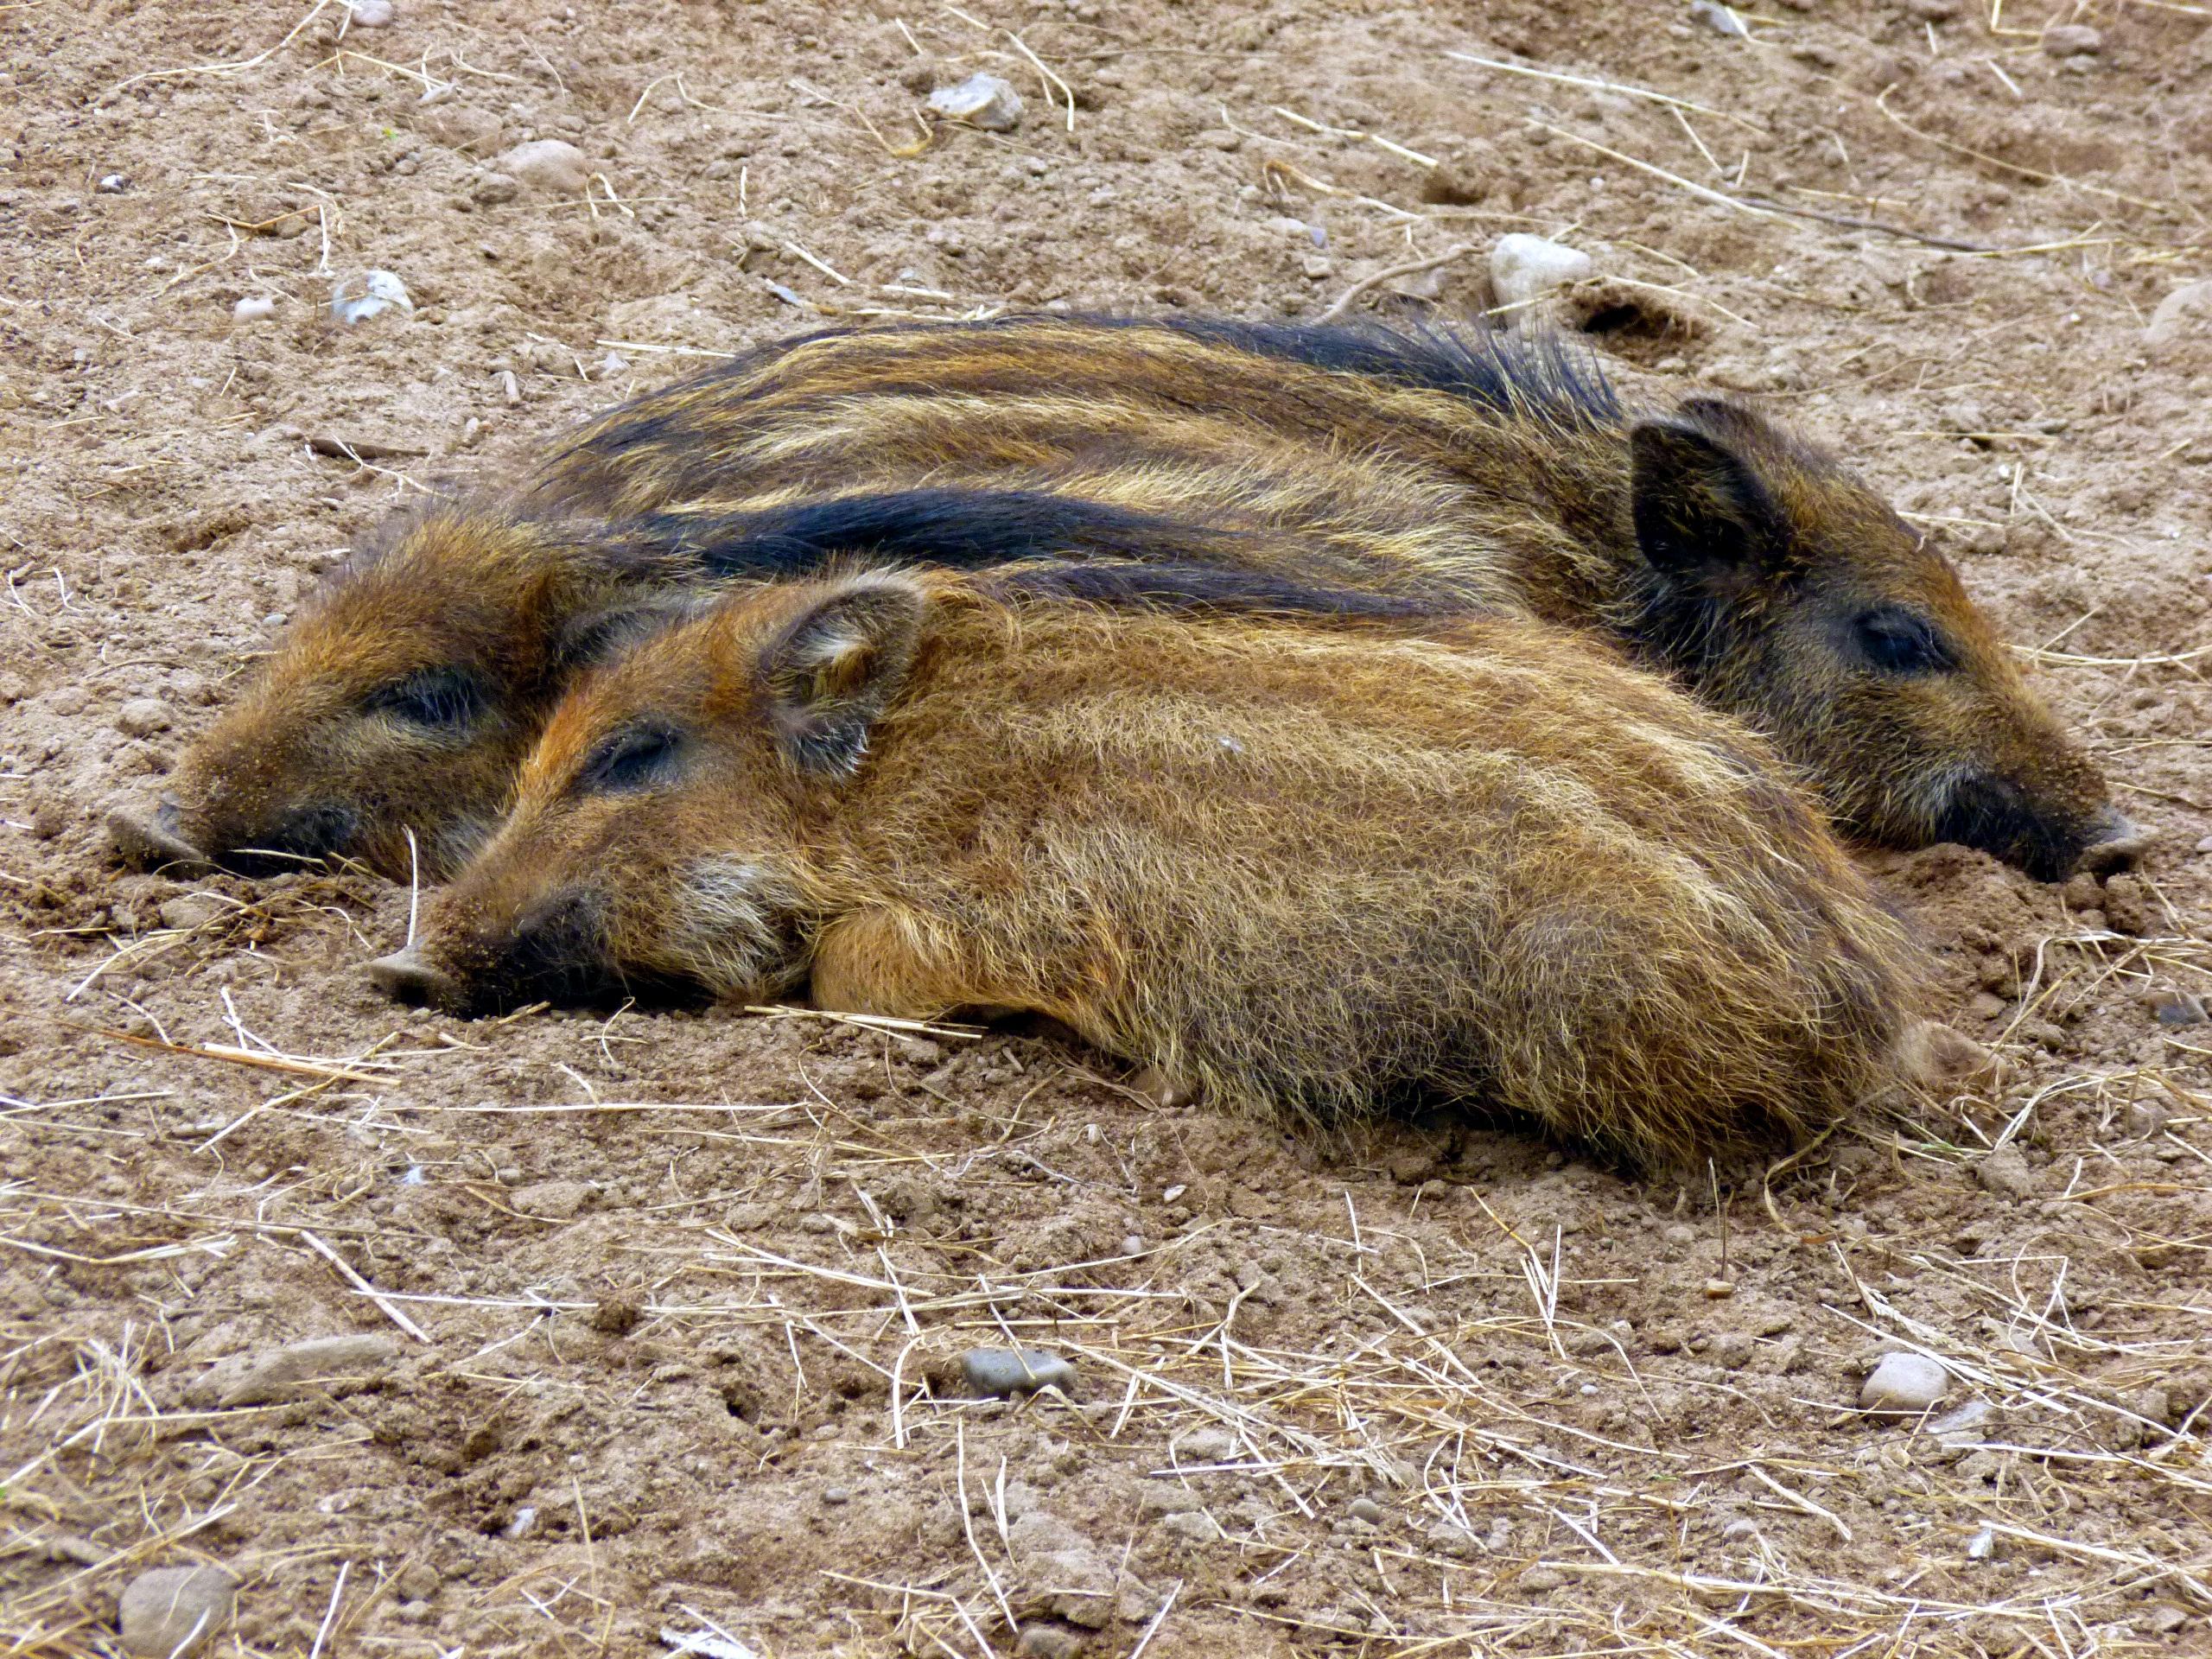 Fotos Gratis Naturaleza Linda Fauna Silvestre Joven Barro